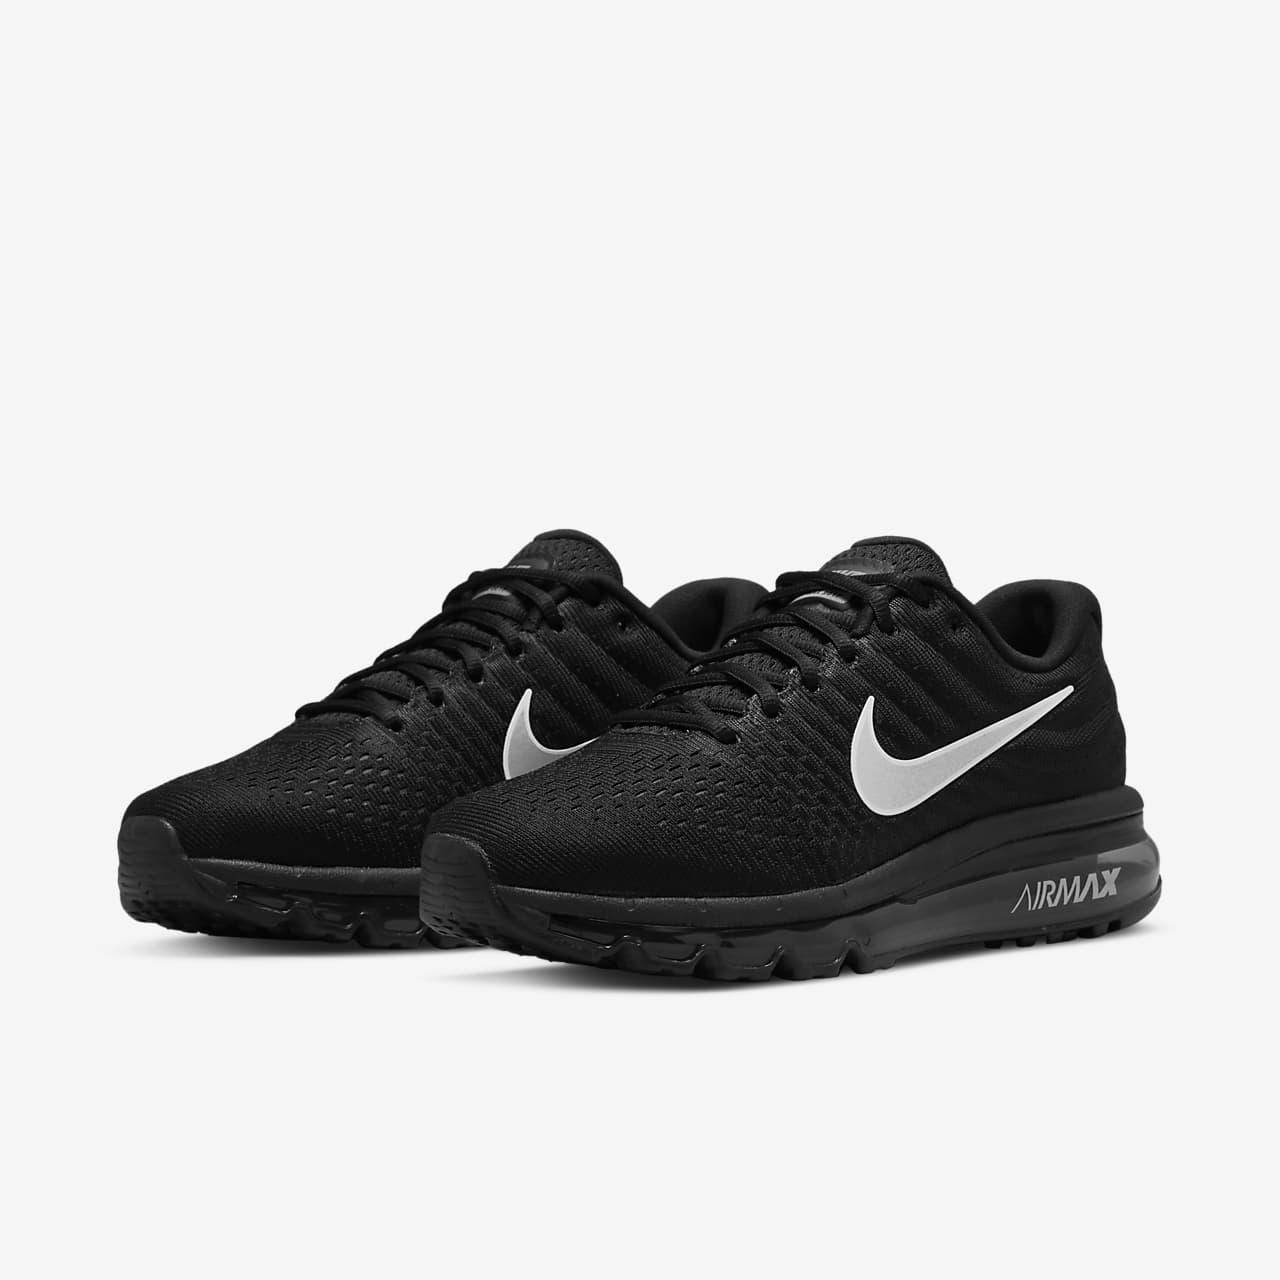 new styles 75faf 1cecf ... Nike Air Max 2017 sko til dame